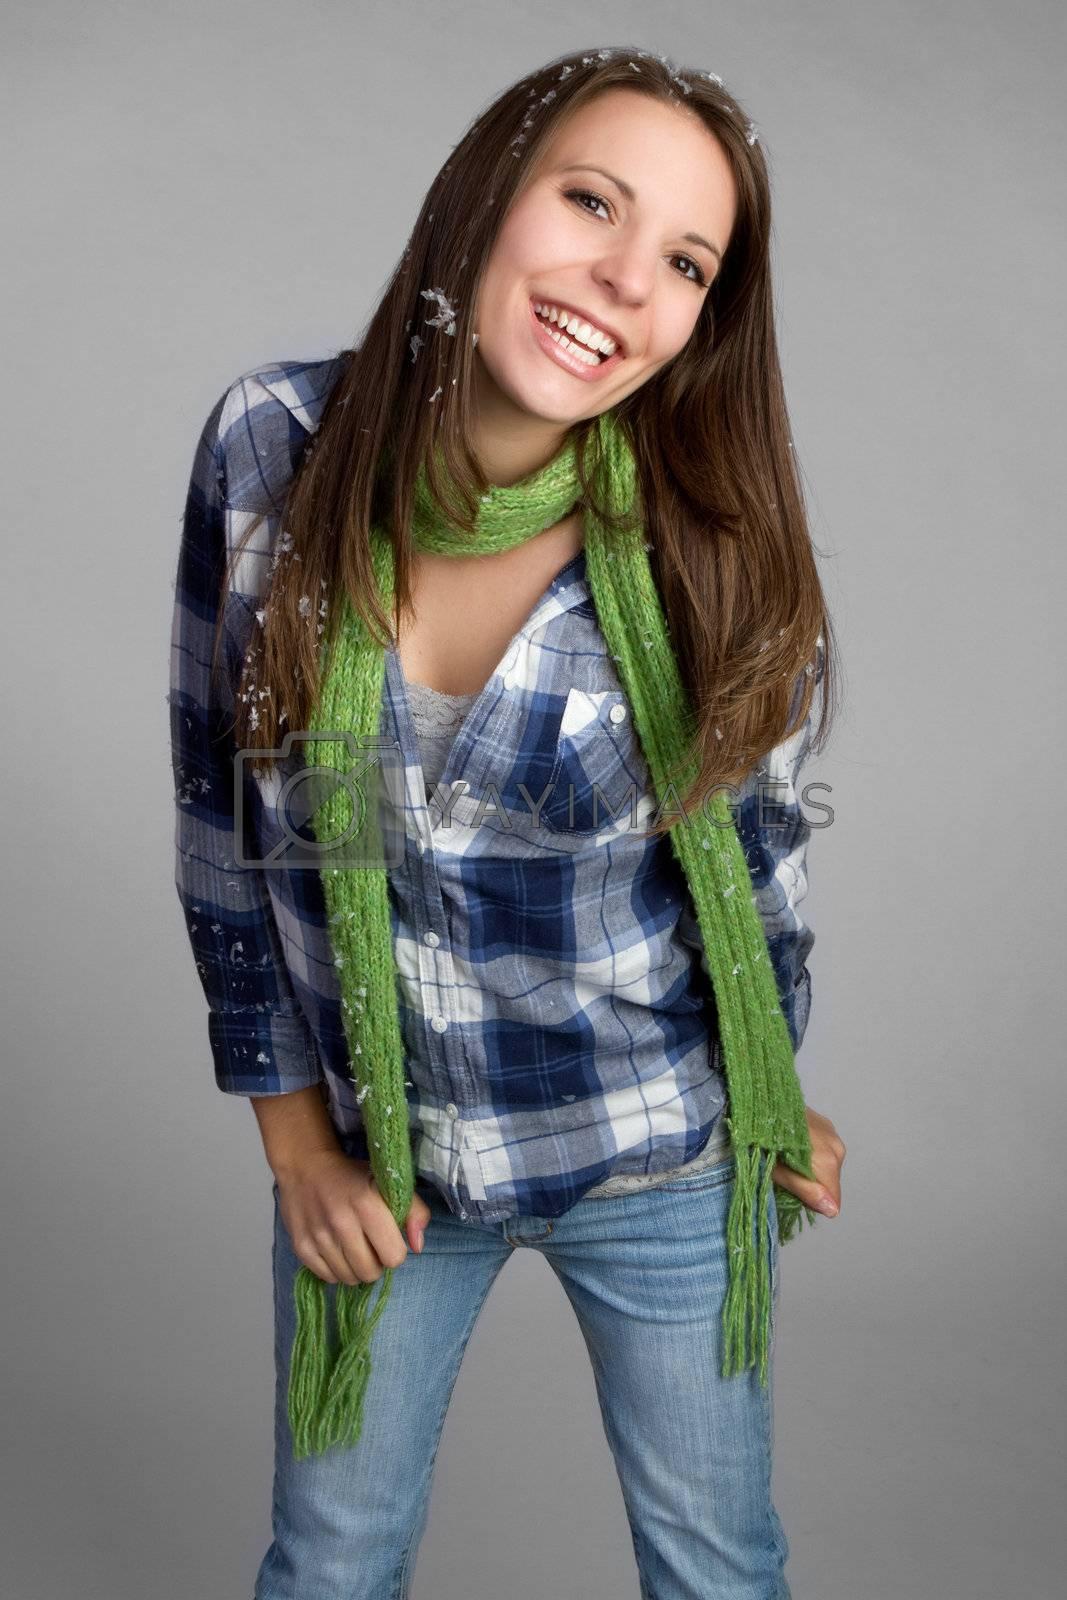 Beautiful teenage winter girl smiling